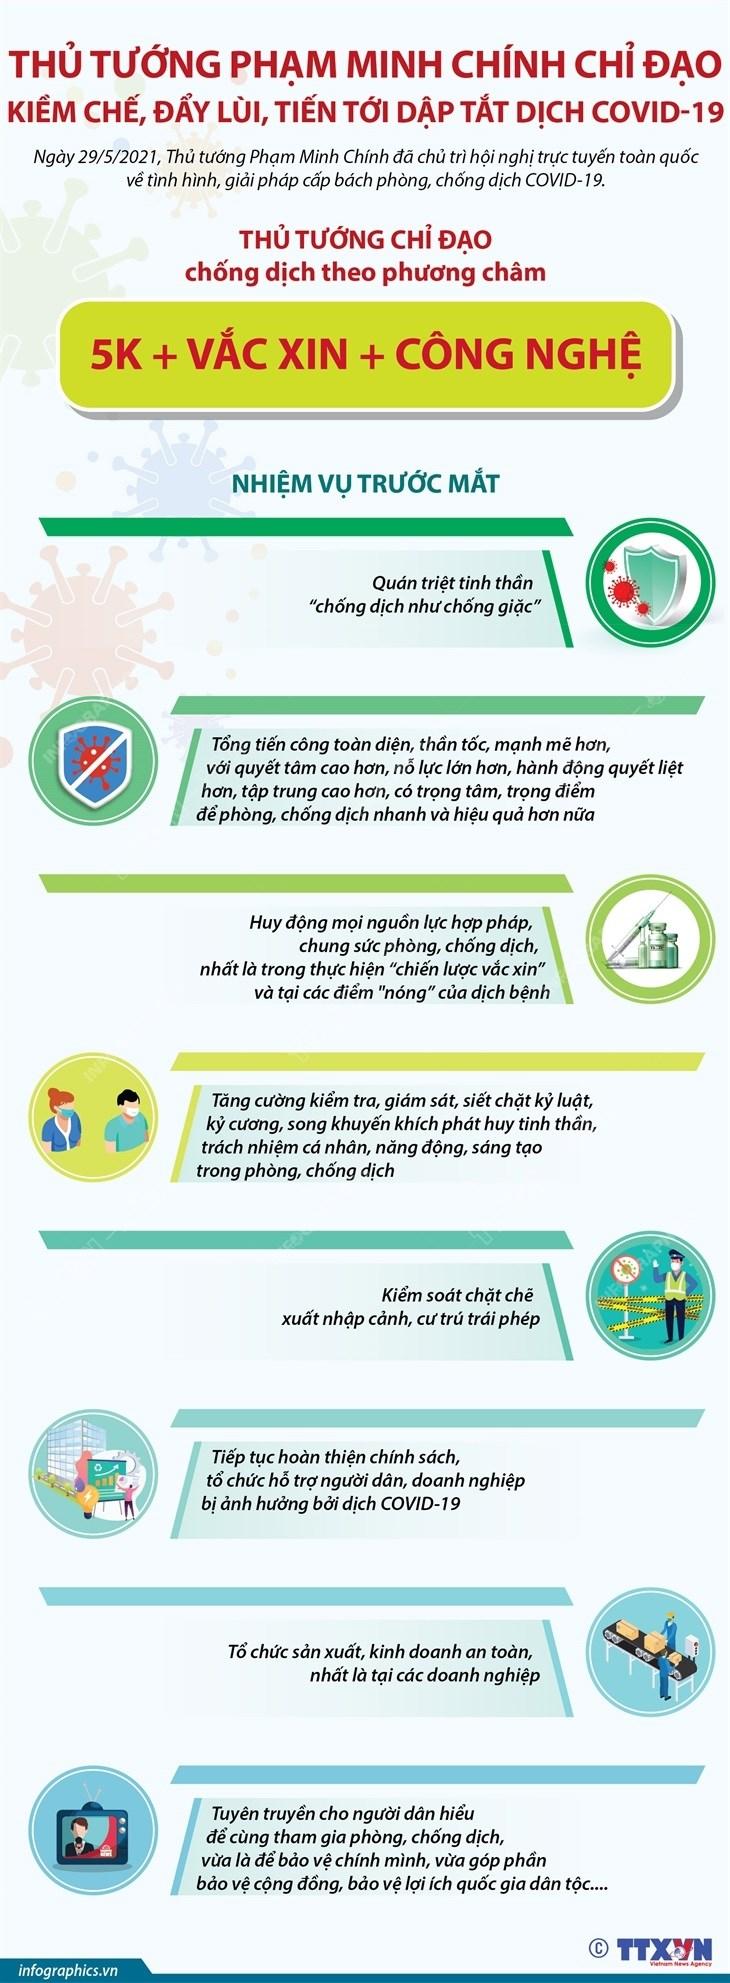 [Infographics] Chi dao cua Thu tuong ve cong tac chong dich COVID-19 hinh anh 1